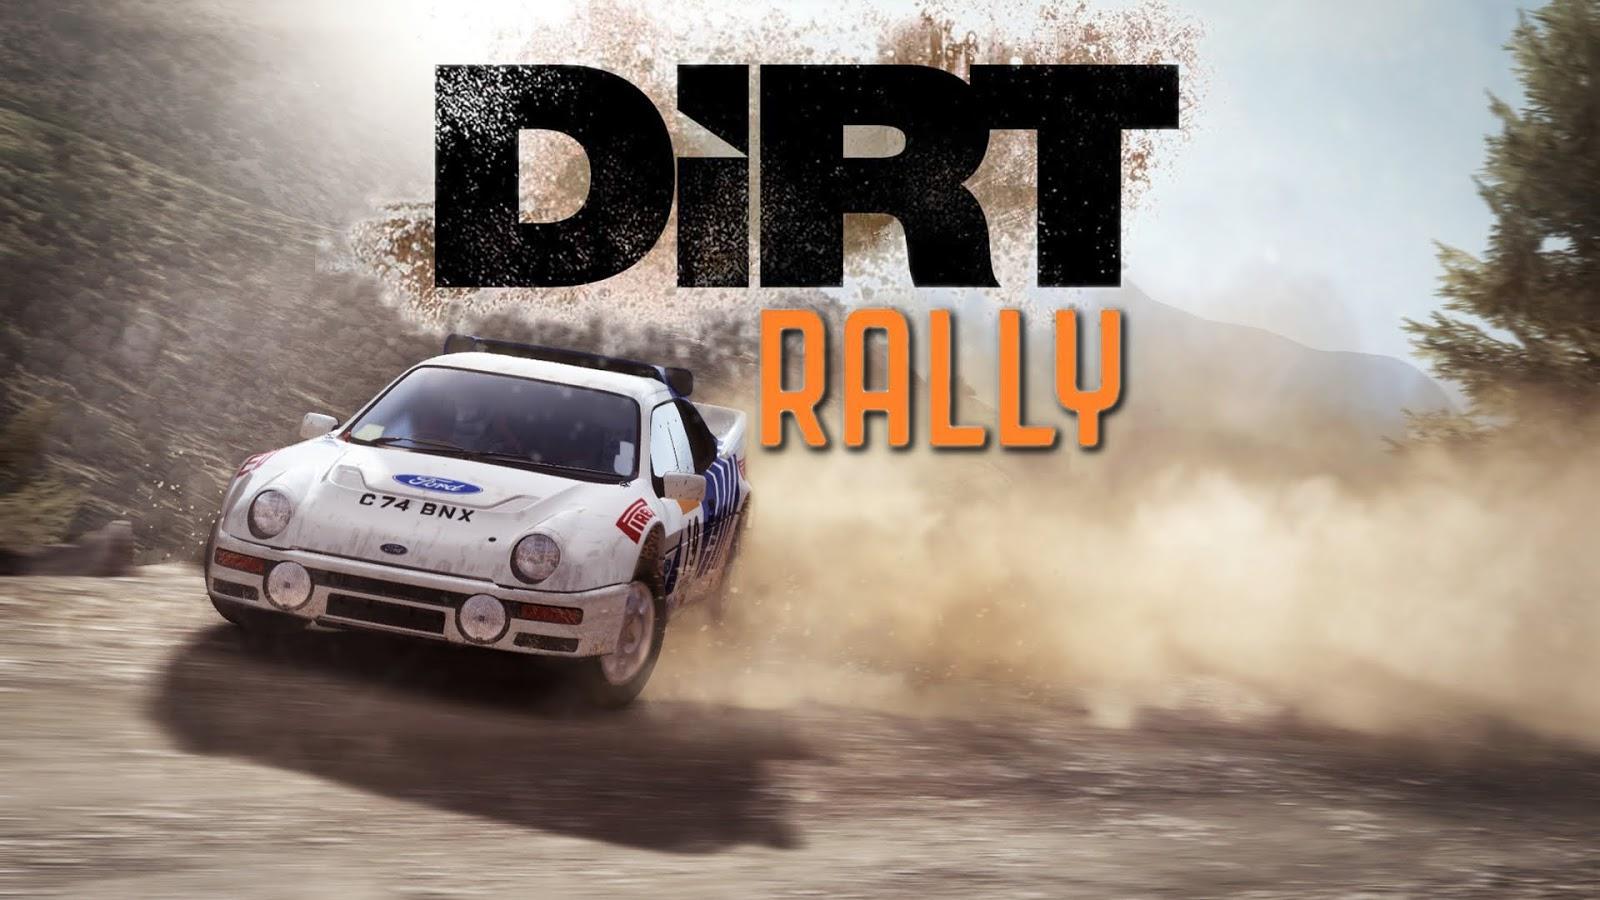 dirt rally pc game download videogamesnest. Black Bedroom Furniture Sets. Home Design Ideas